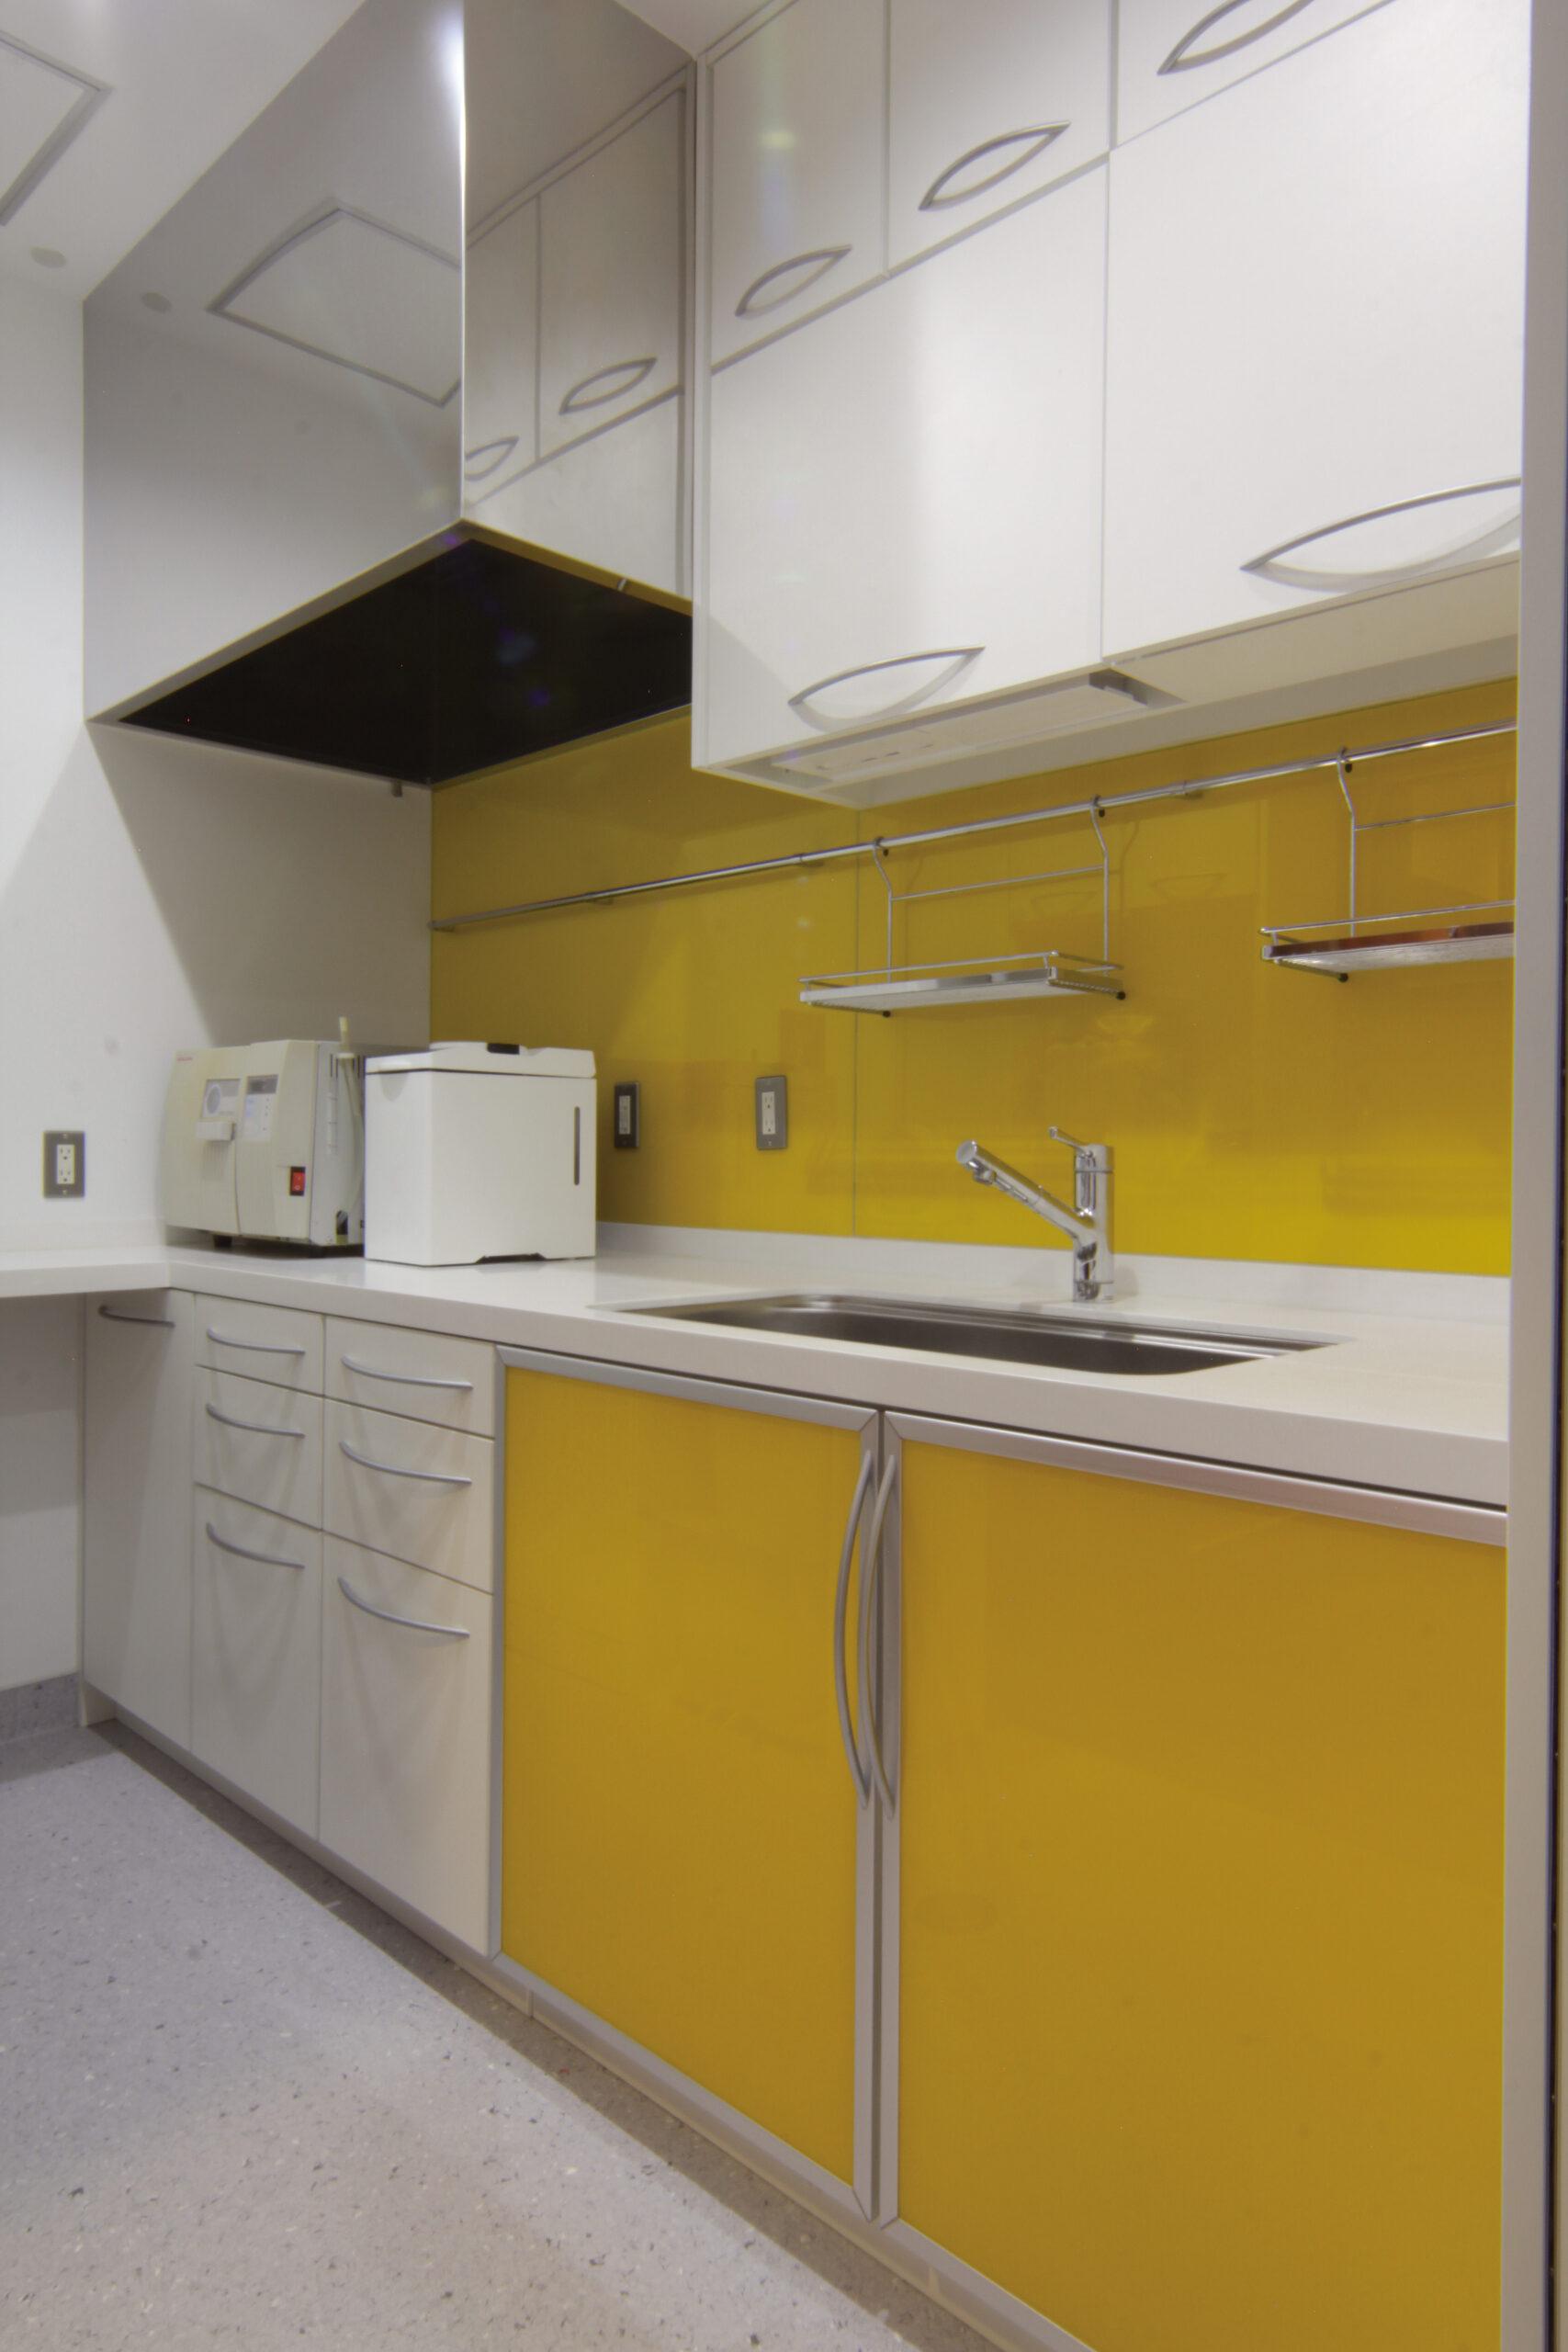 treatmentroom_4